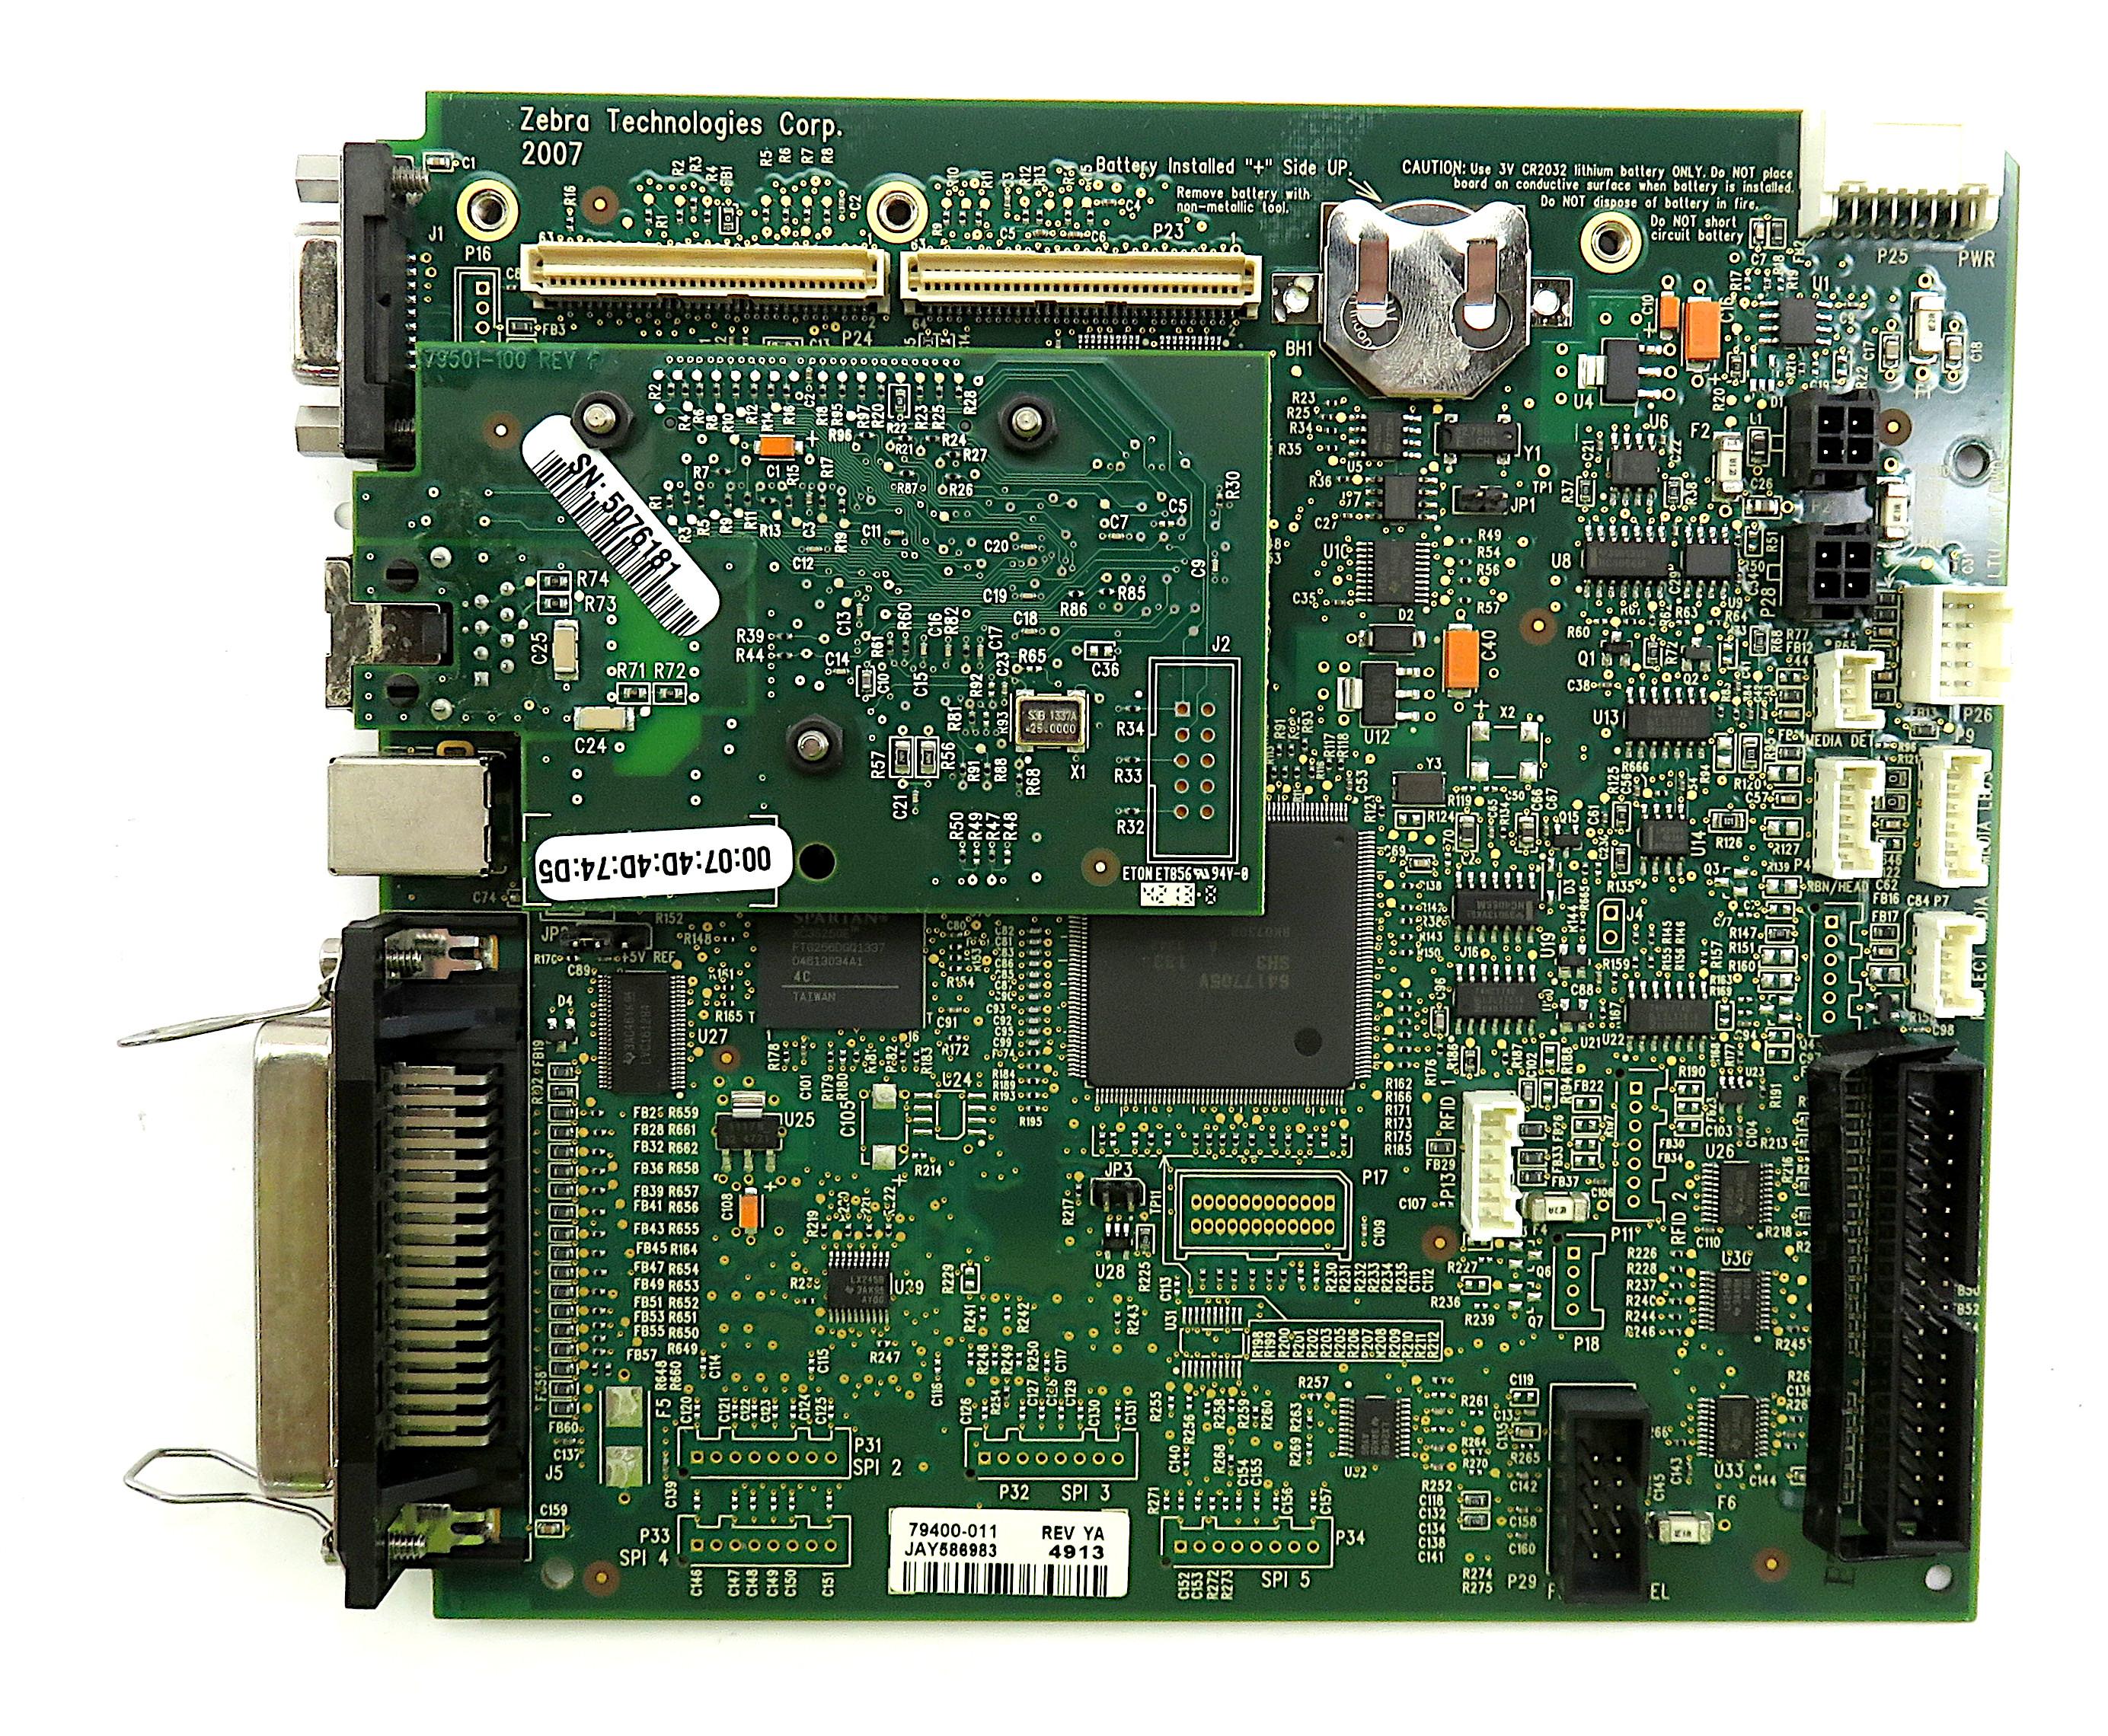 Zebra 79400-011 Mainboard f/ ZM400 Label Printer w/ Eton ET856 Ethernet board